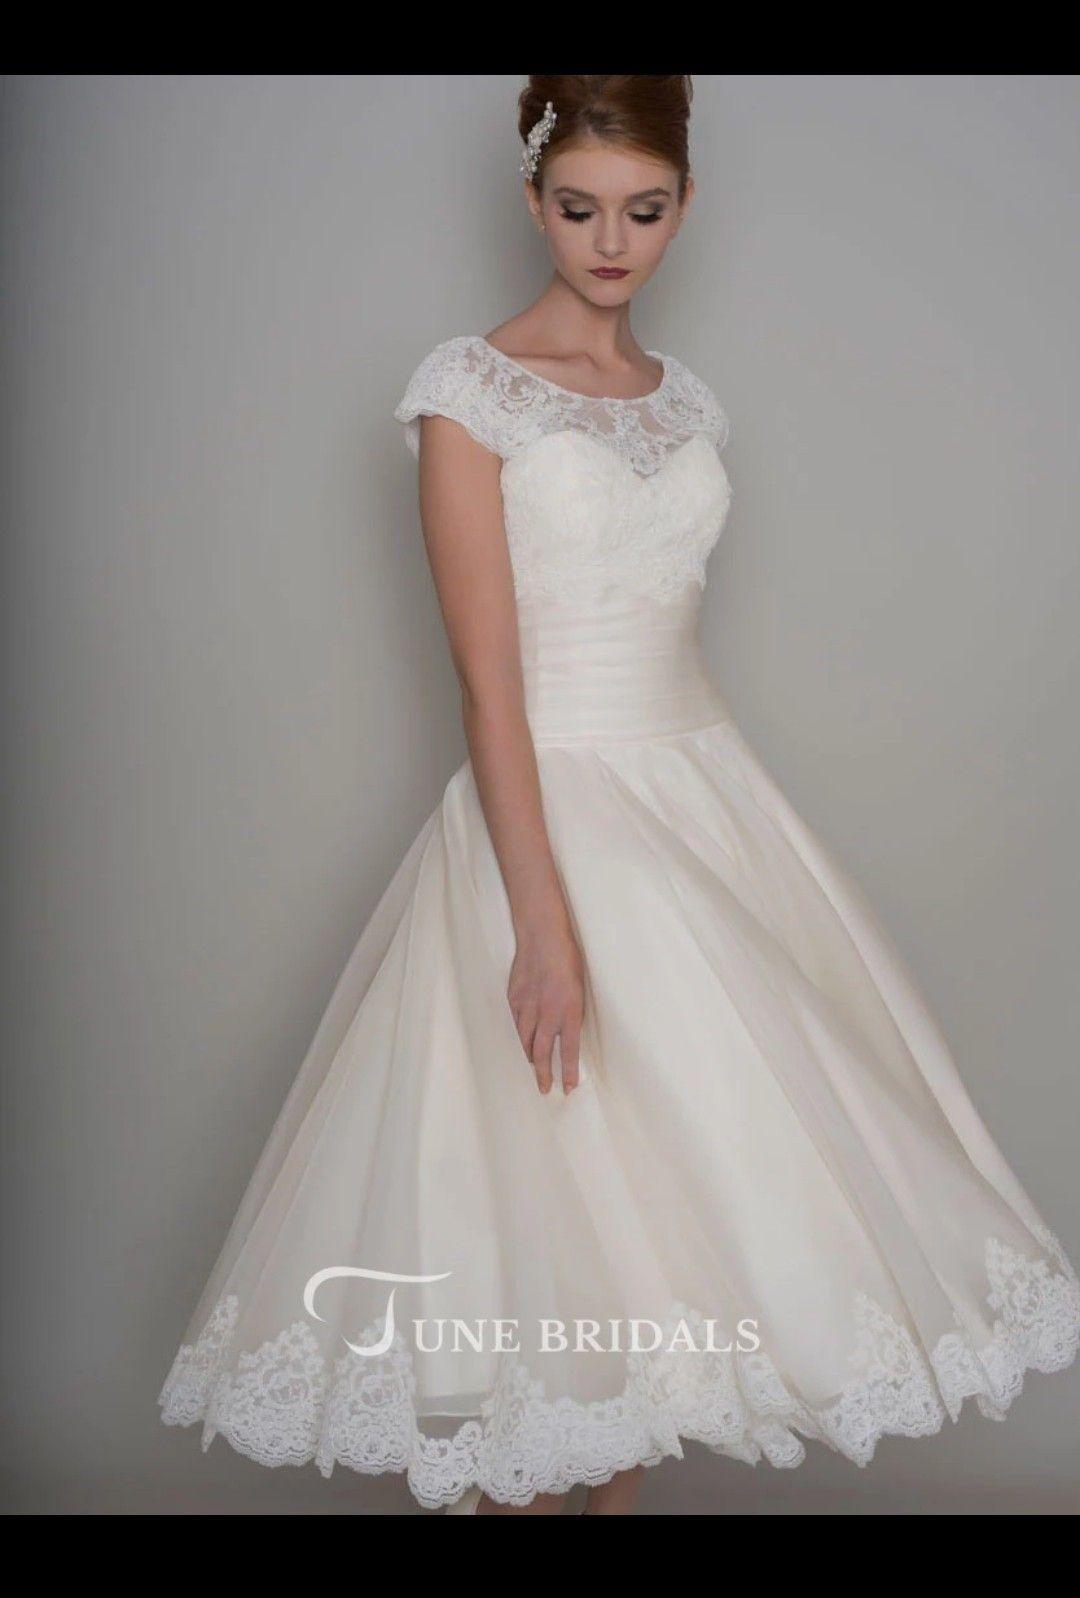 Pin by Deb Moulton on Brides | Tea length wedding dress ...